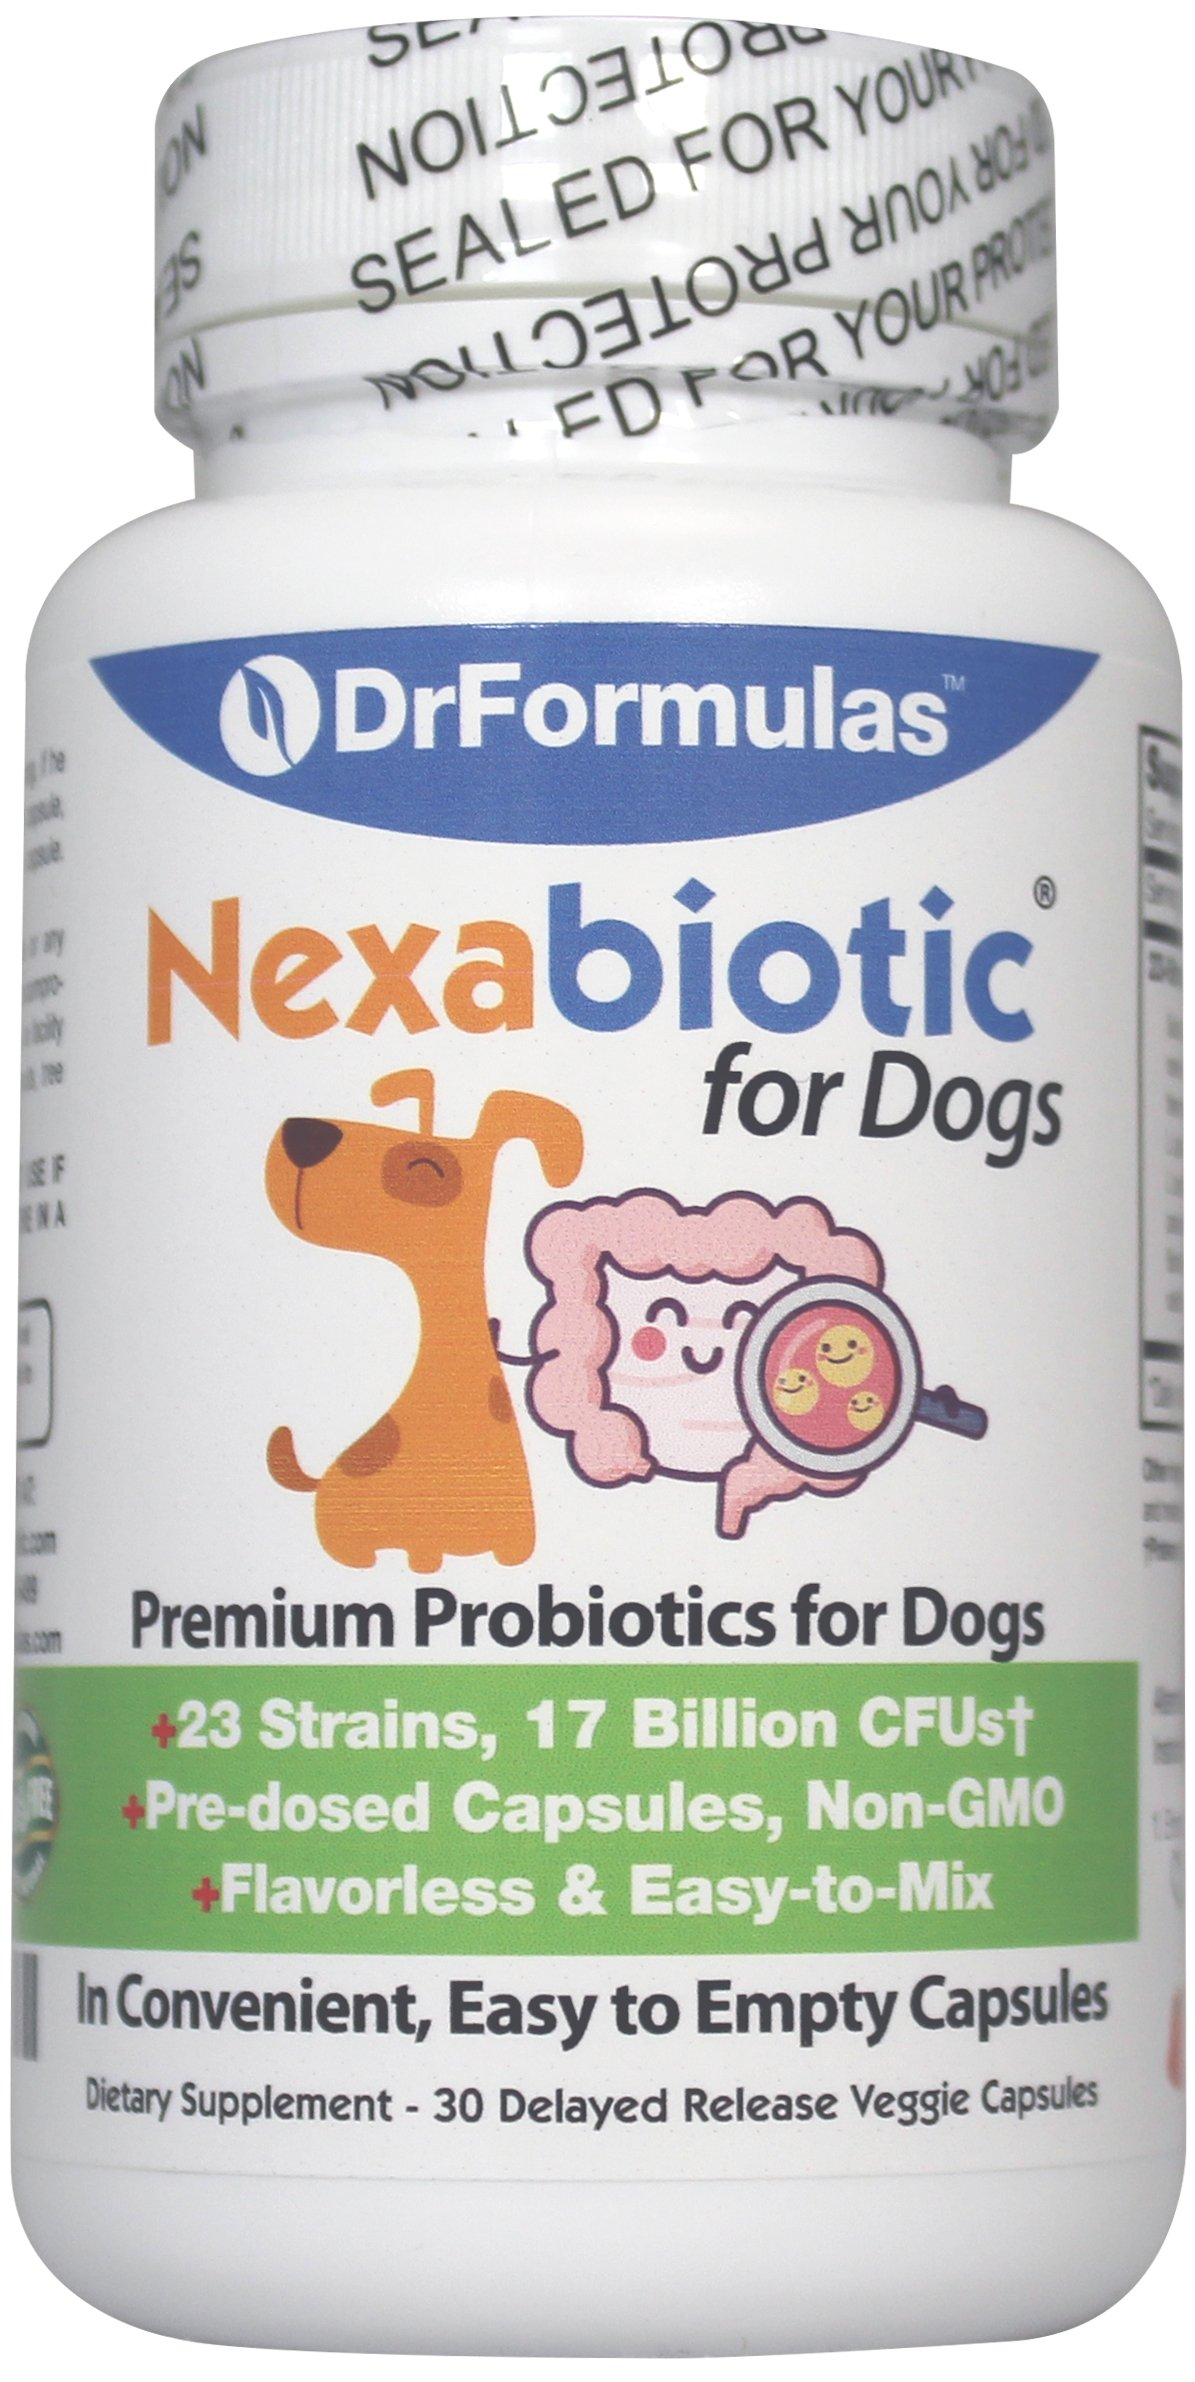 DrFormulas Probiotics for Dogs & Puppies Pets Diarrhea Treatment   Flavorless, Pre-dosed, 23 Premium Nexabiotic Probiotic for Pets with Saccharomyces Boulardii, Lactobacillus Acidophilus, 30 Doses by DrFormulas